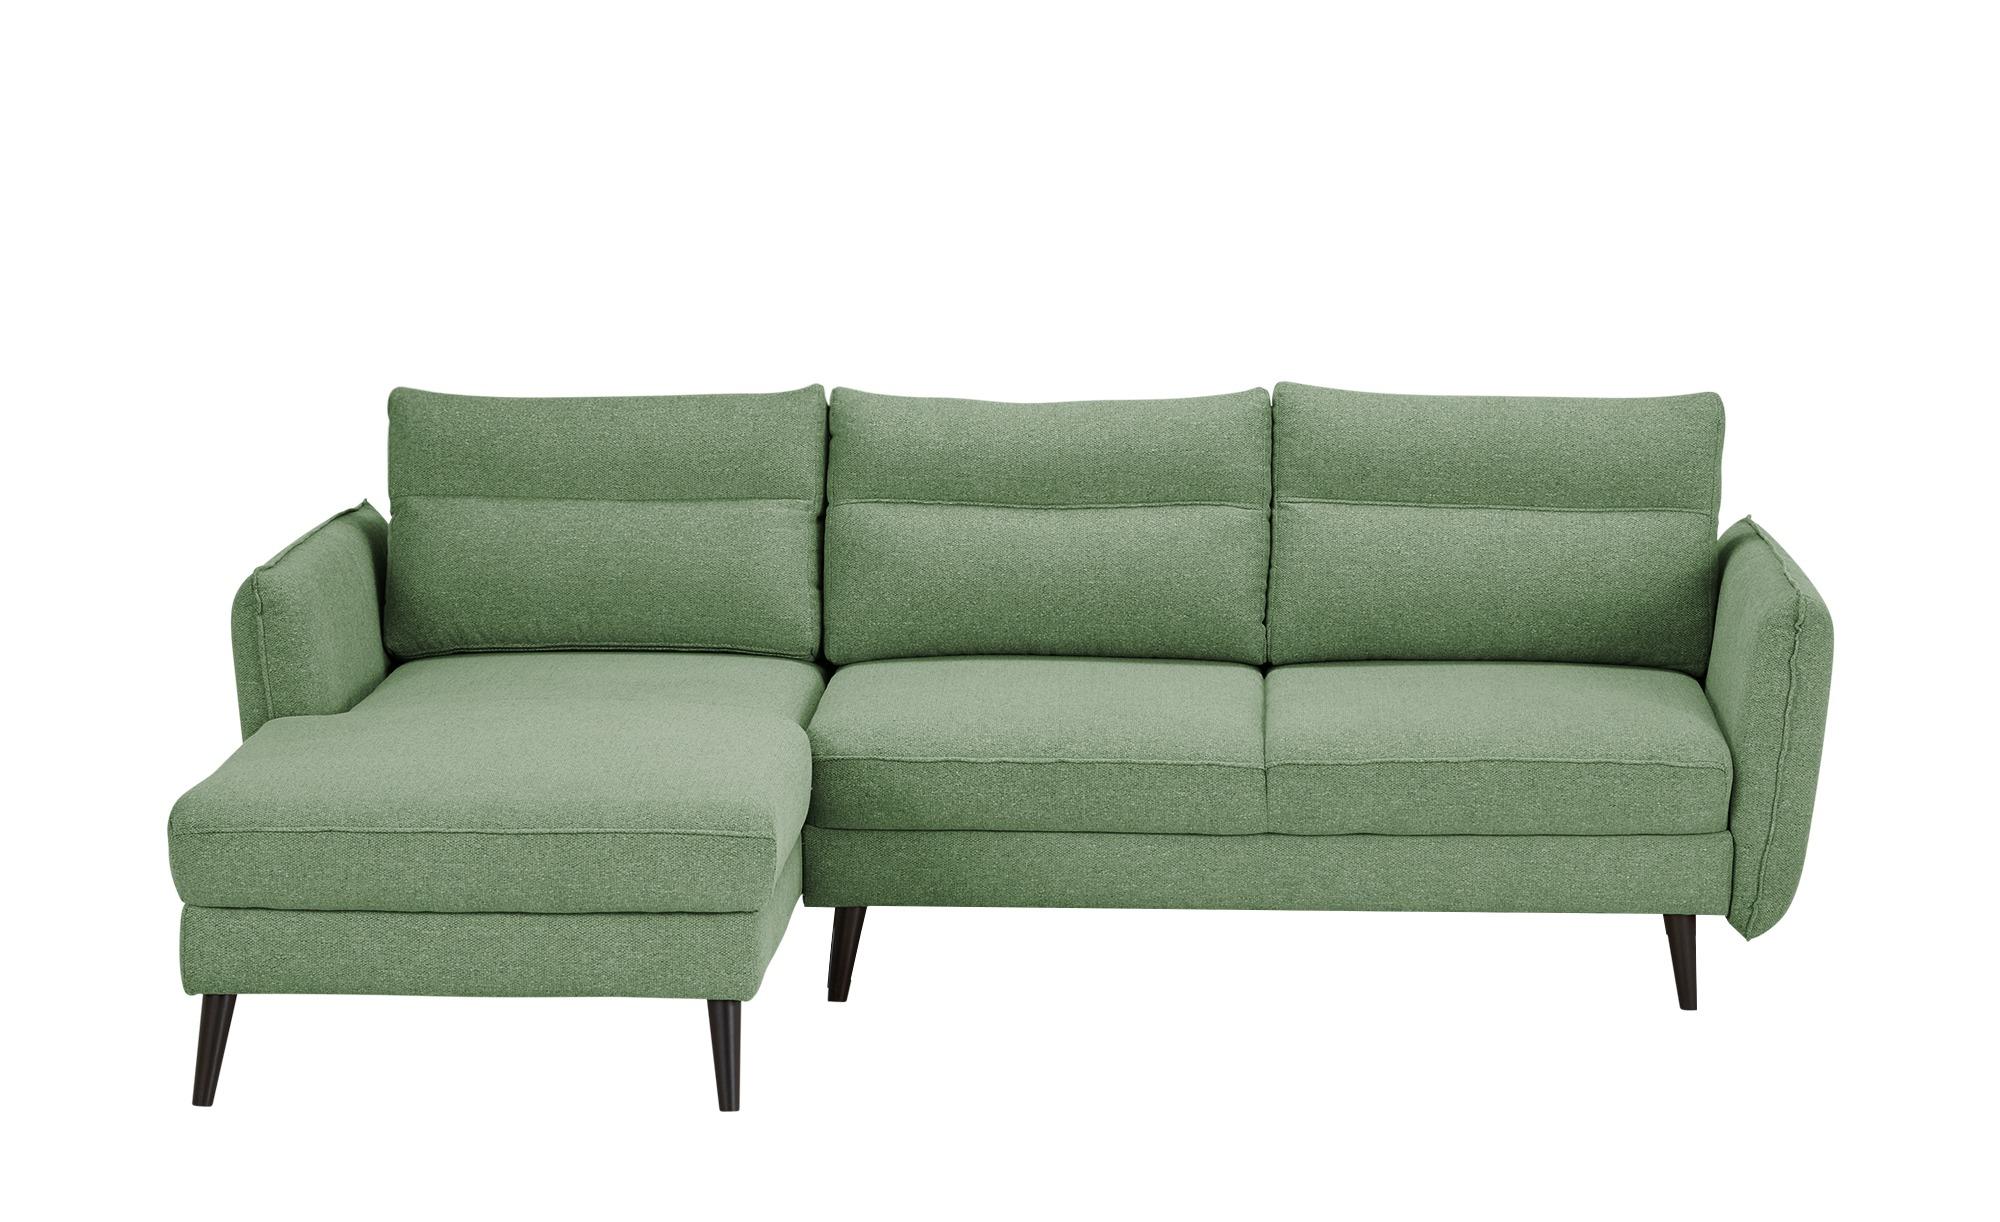 switch Ecksofa  Caramello ¦ grün ¦ Maße (cm): H: 86 Polstermöbel > Sofas > Ecksofas - Höffner